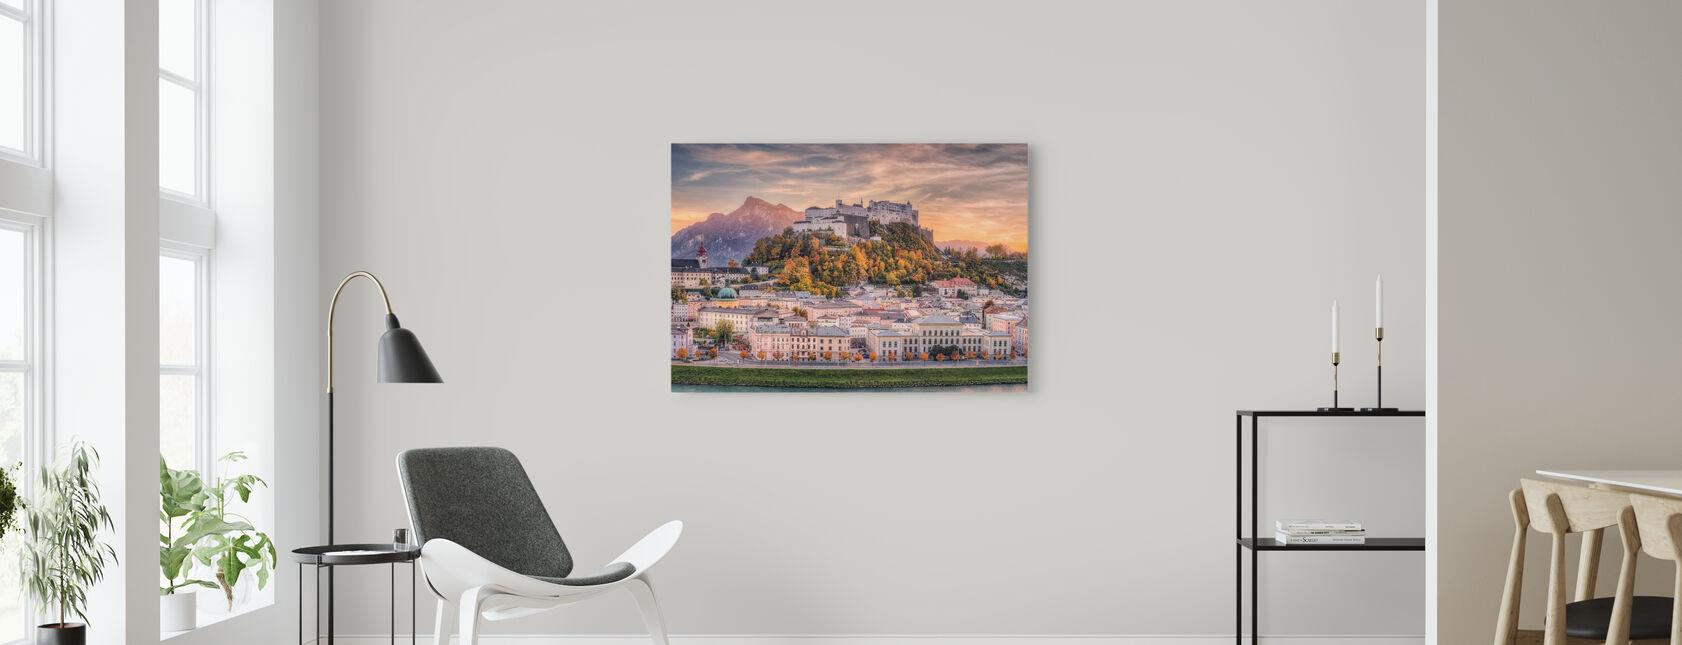 Salzburg in herfstkleuren - Canvas print - Woonkamer